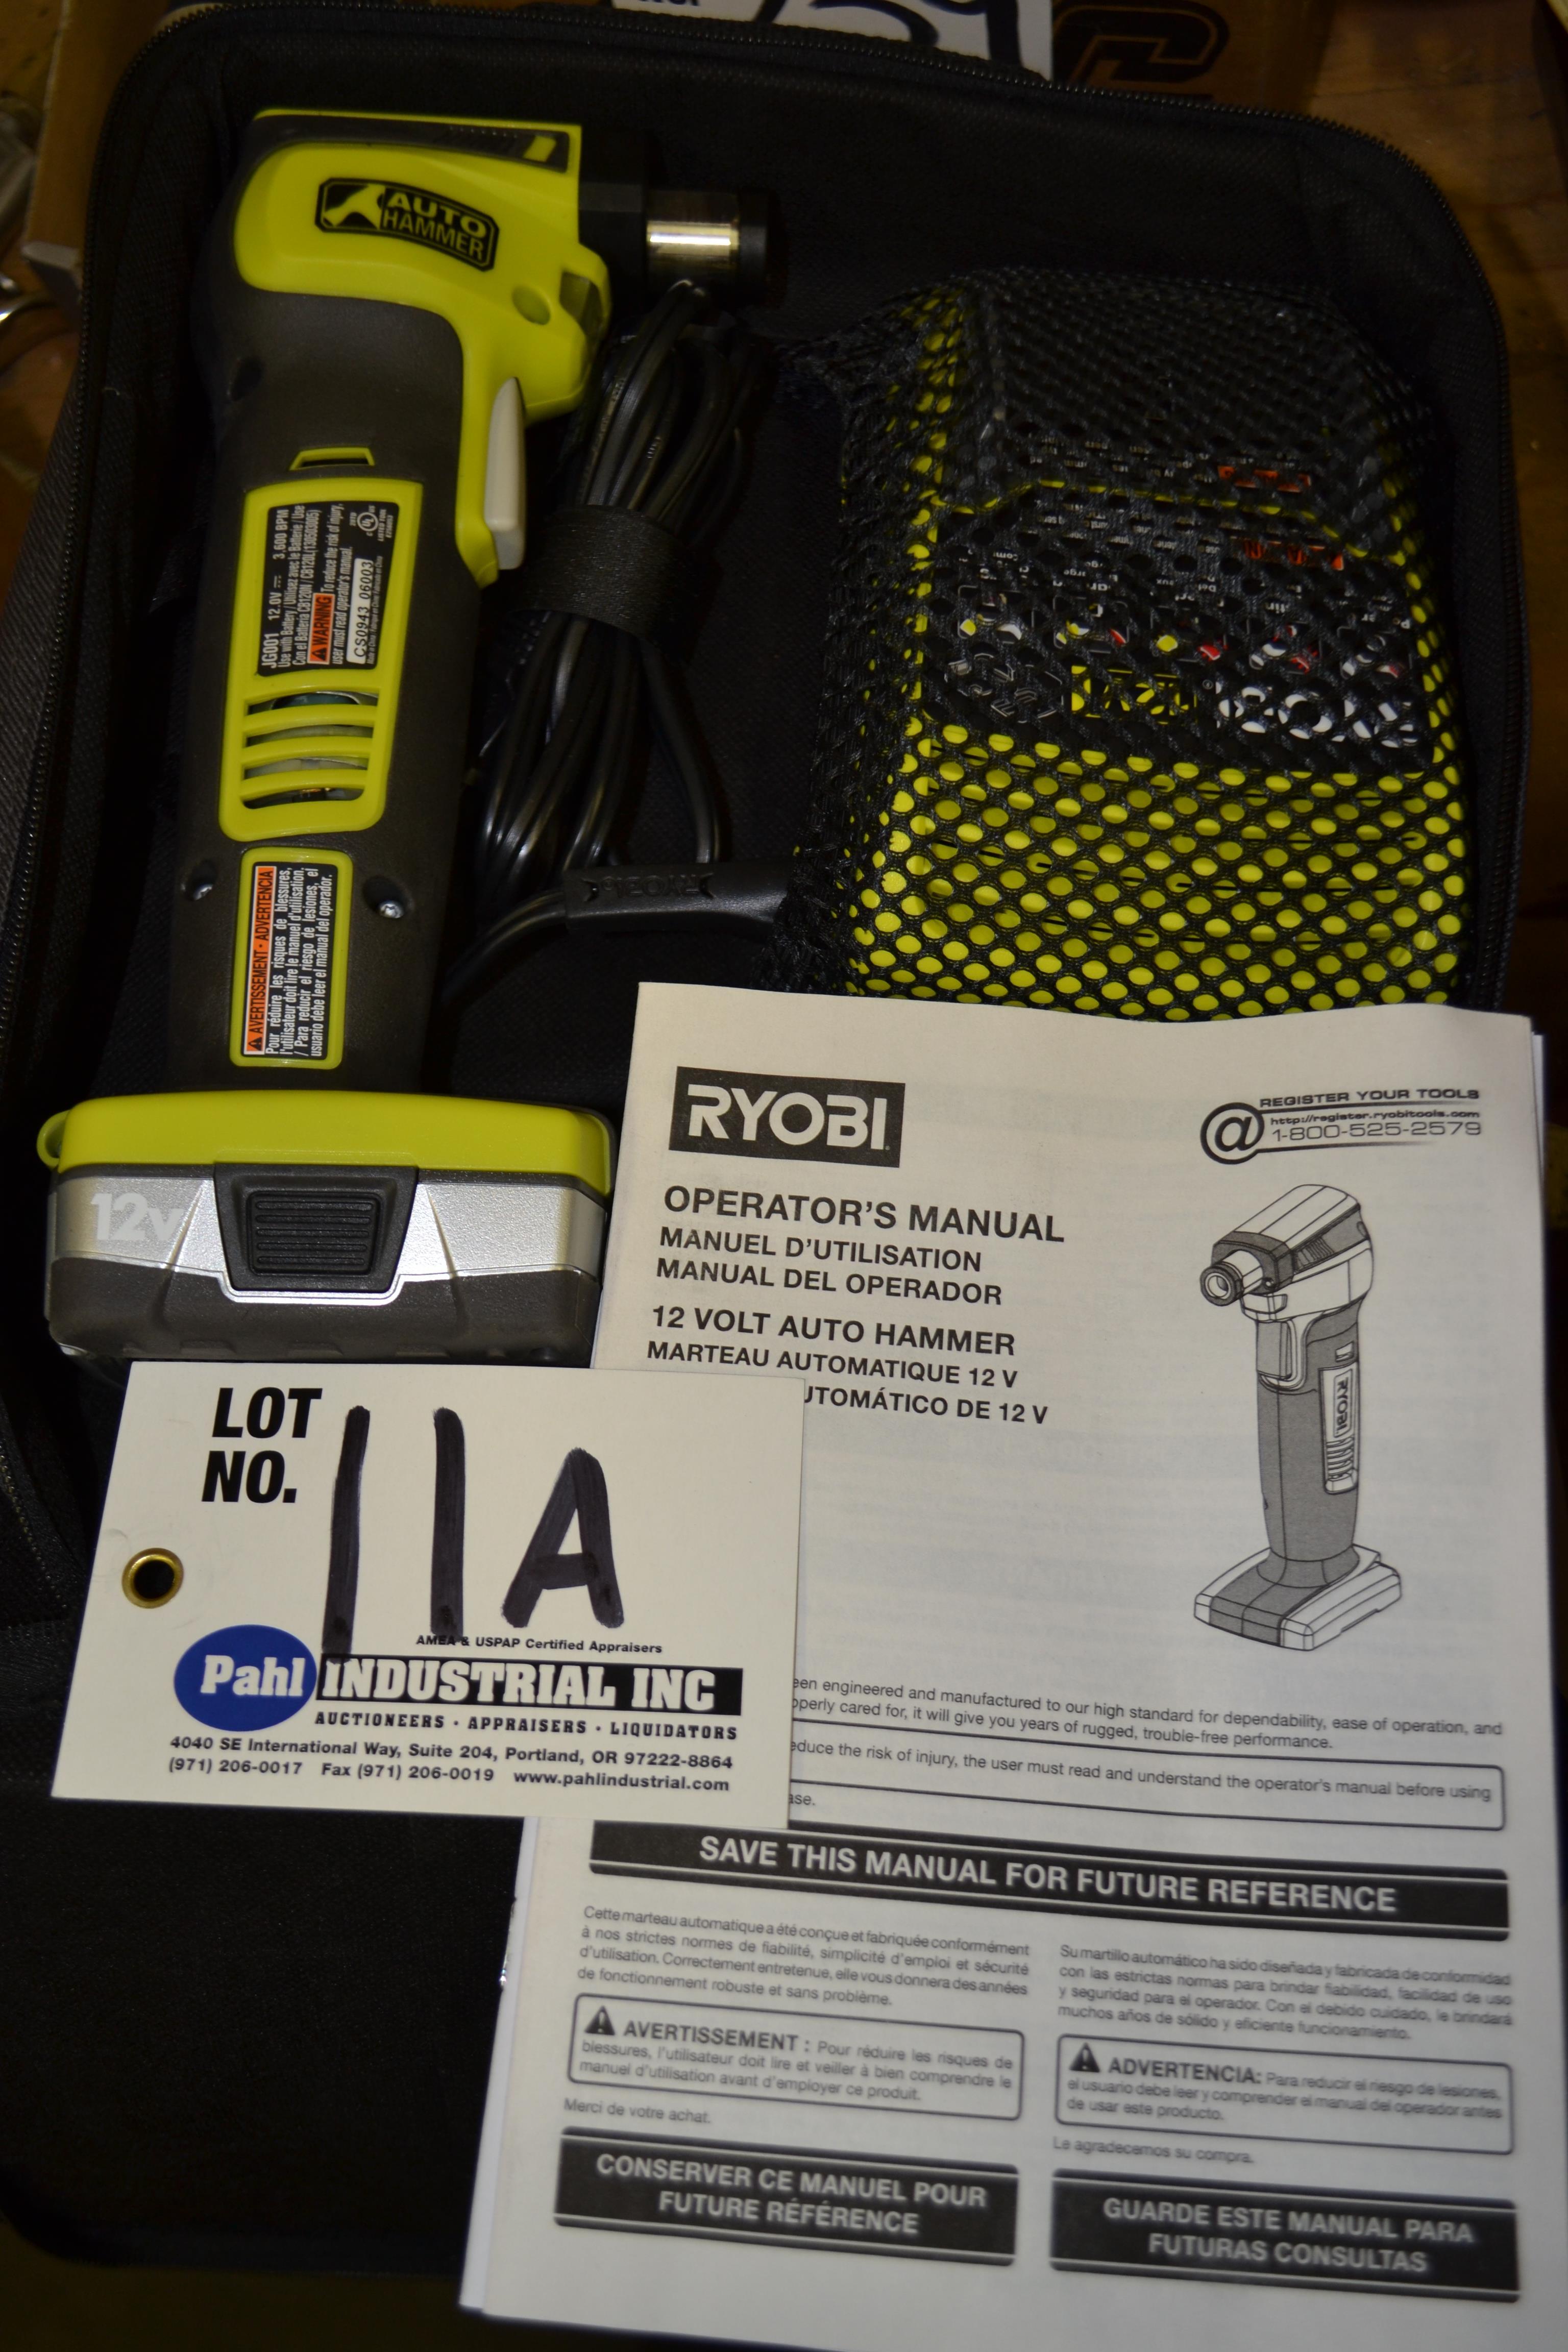 Ryobi JGC01 Cordless Auto Hammer